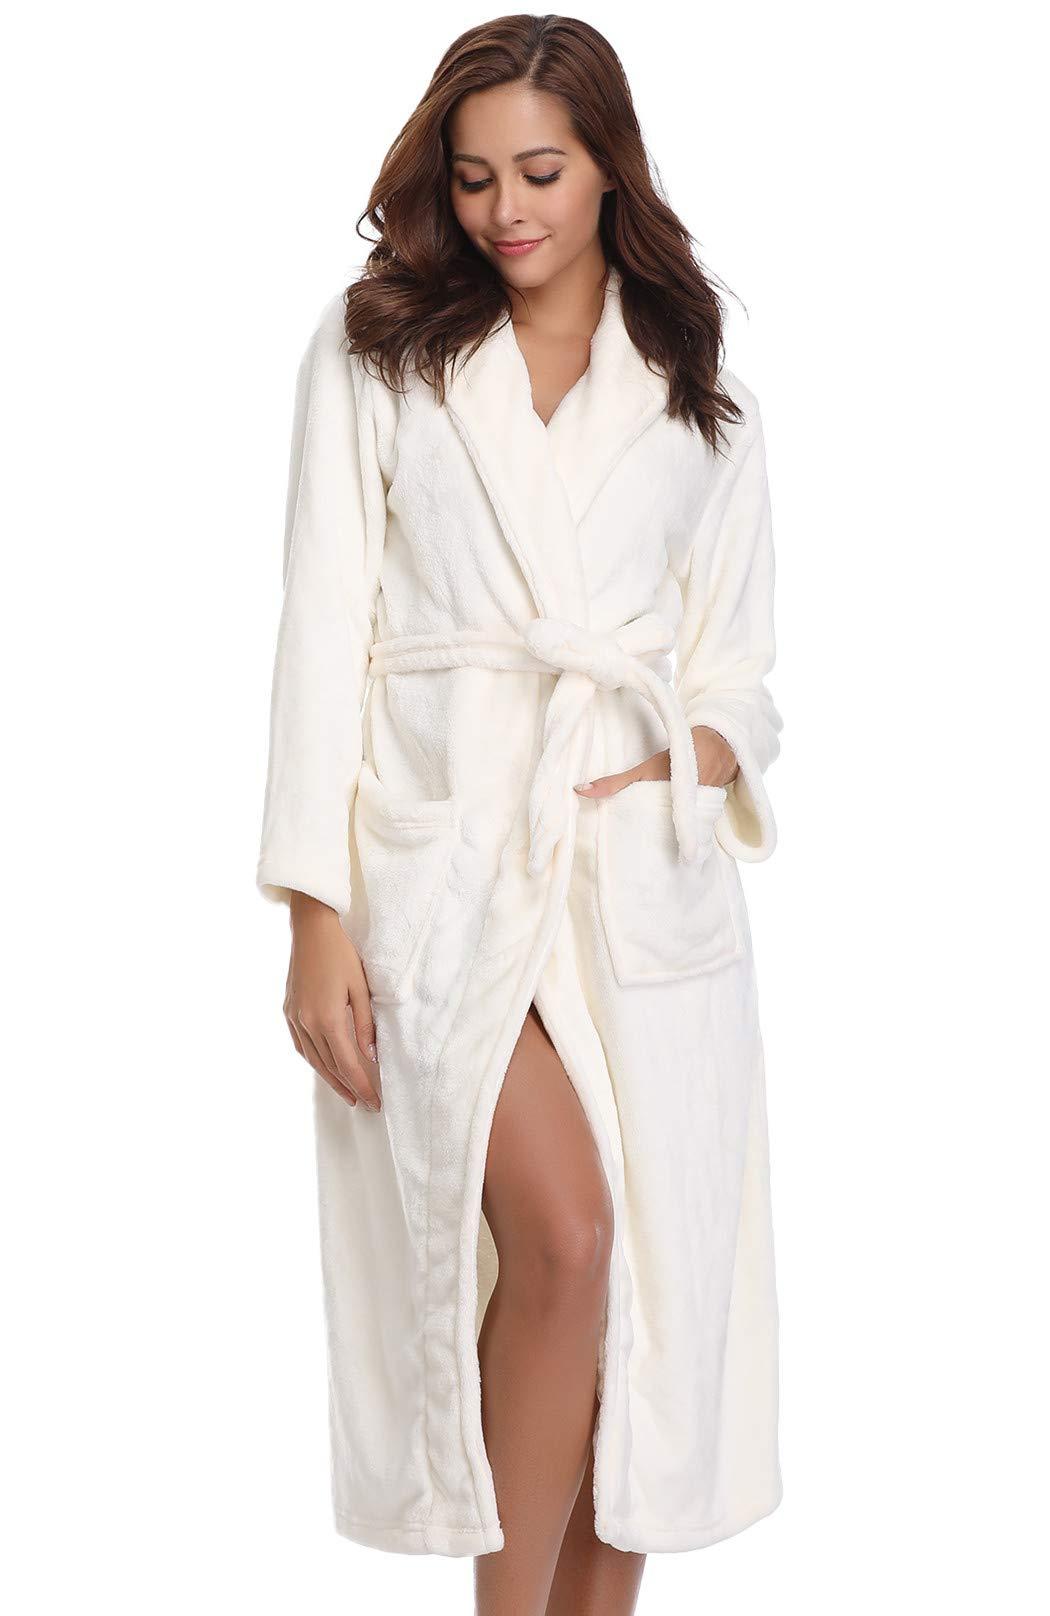 Vlazom Women S Warm Fleece Robe With Hooded Soft Plush Bathrobe Fluffy Long House Coat